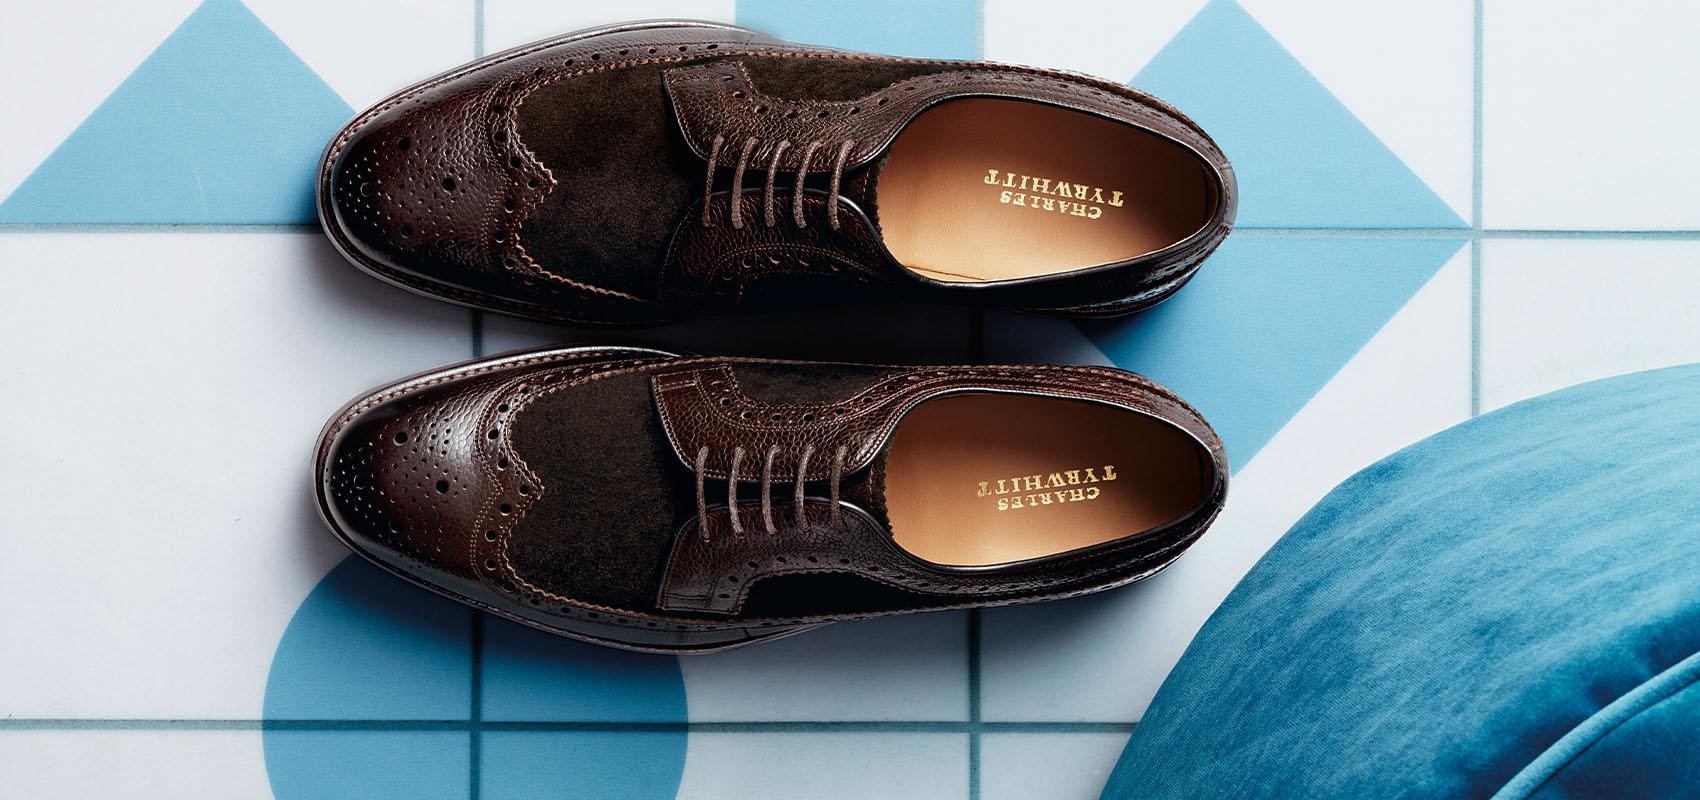 Charles Tyrwhitt Chaussures Pied Large